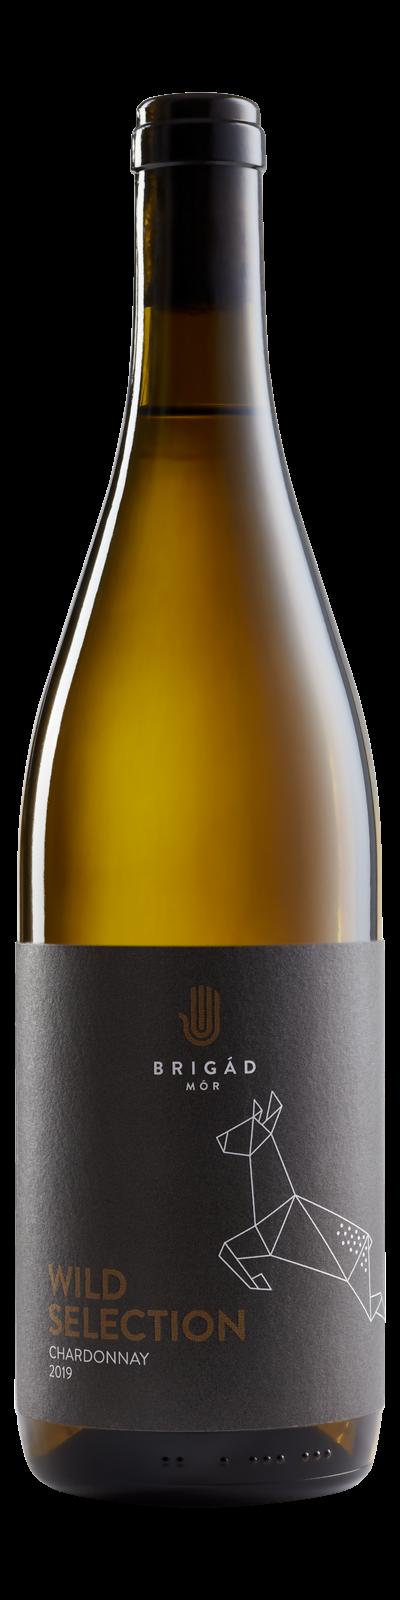 Wild Selection Chardonnay -  BRIGÁD Mór